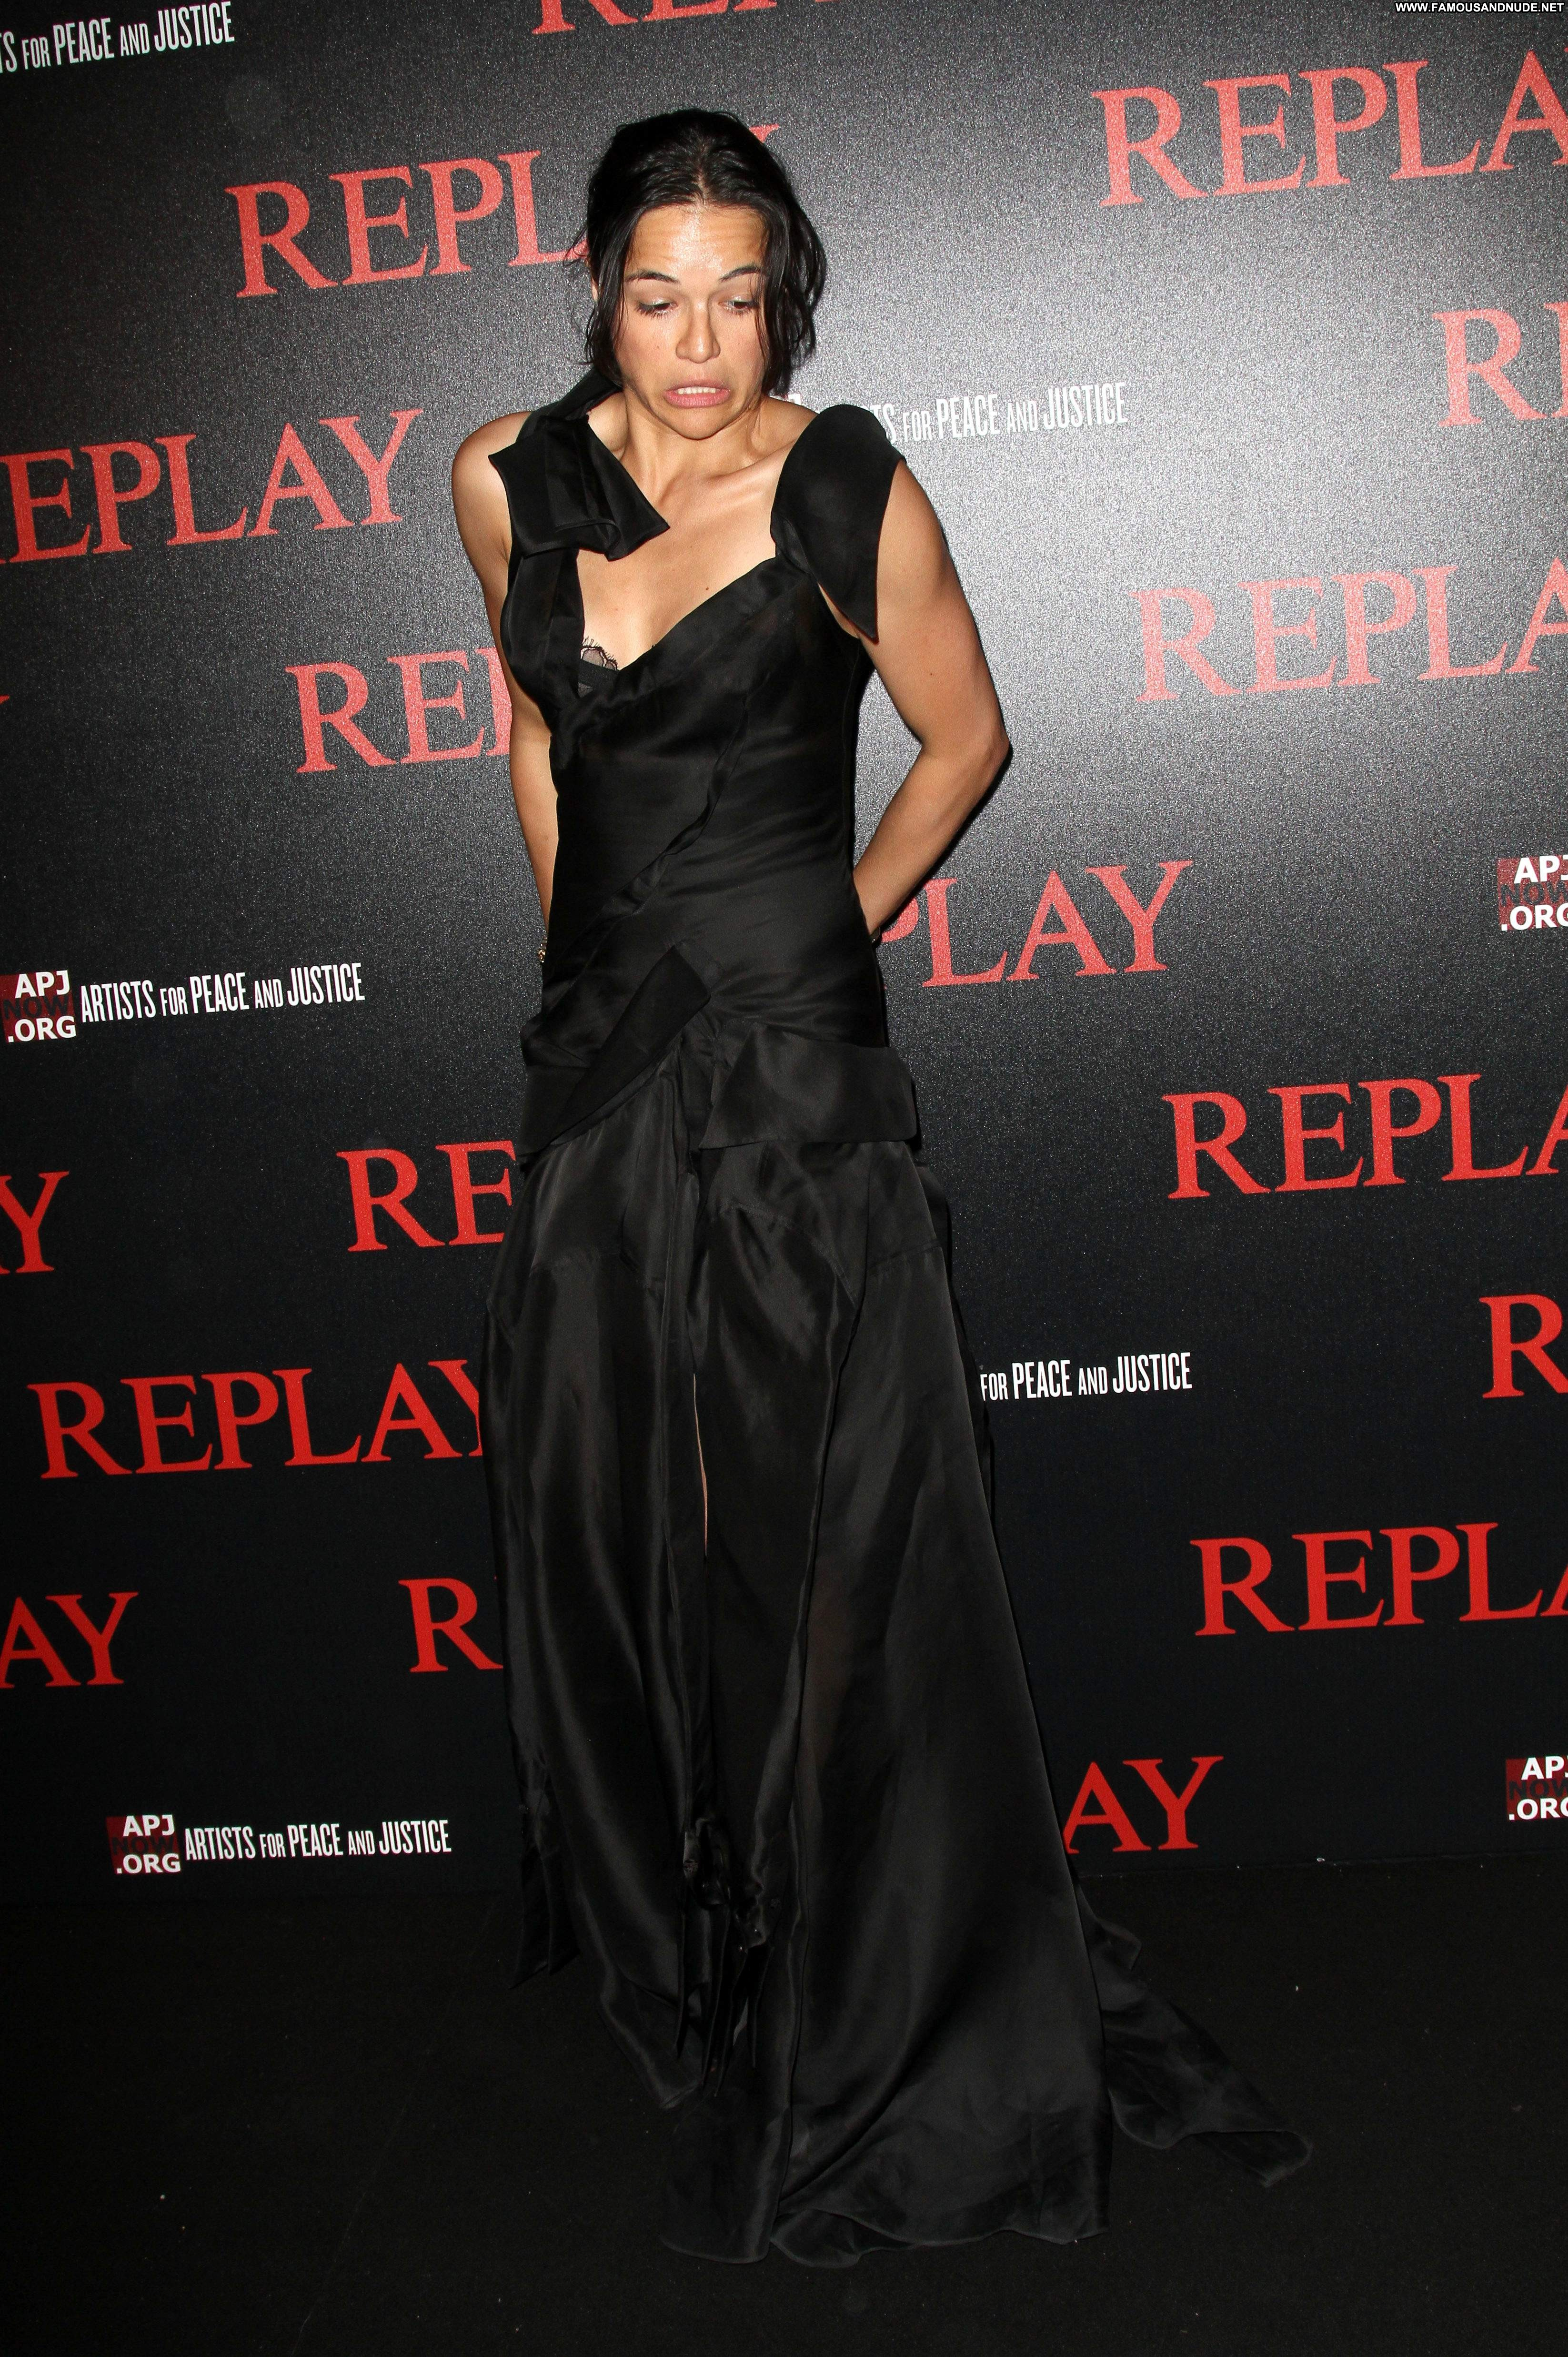 Michelle Rodriguez fully nude photos » Nudestan.com